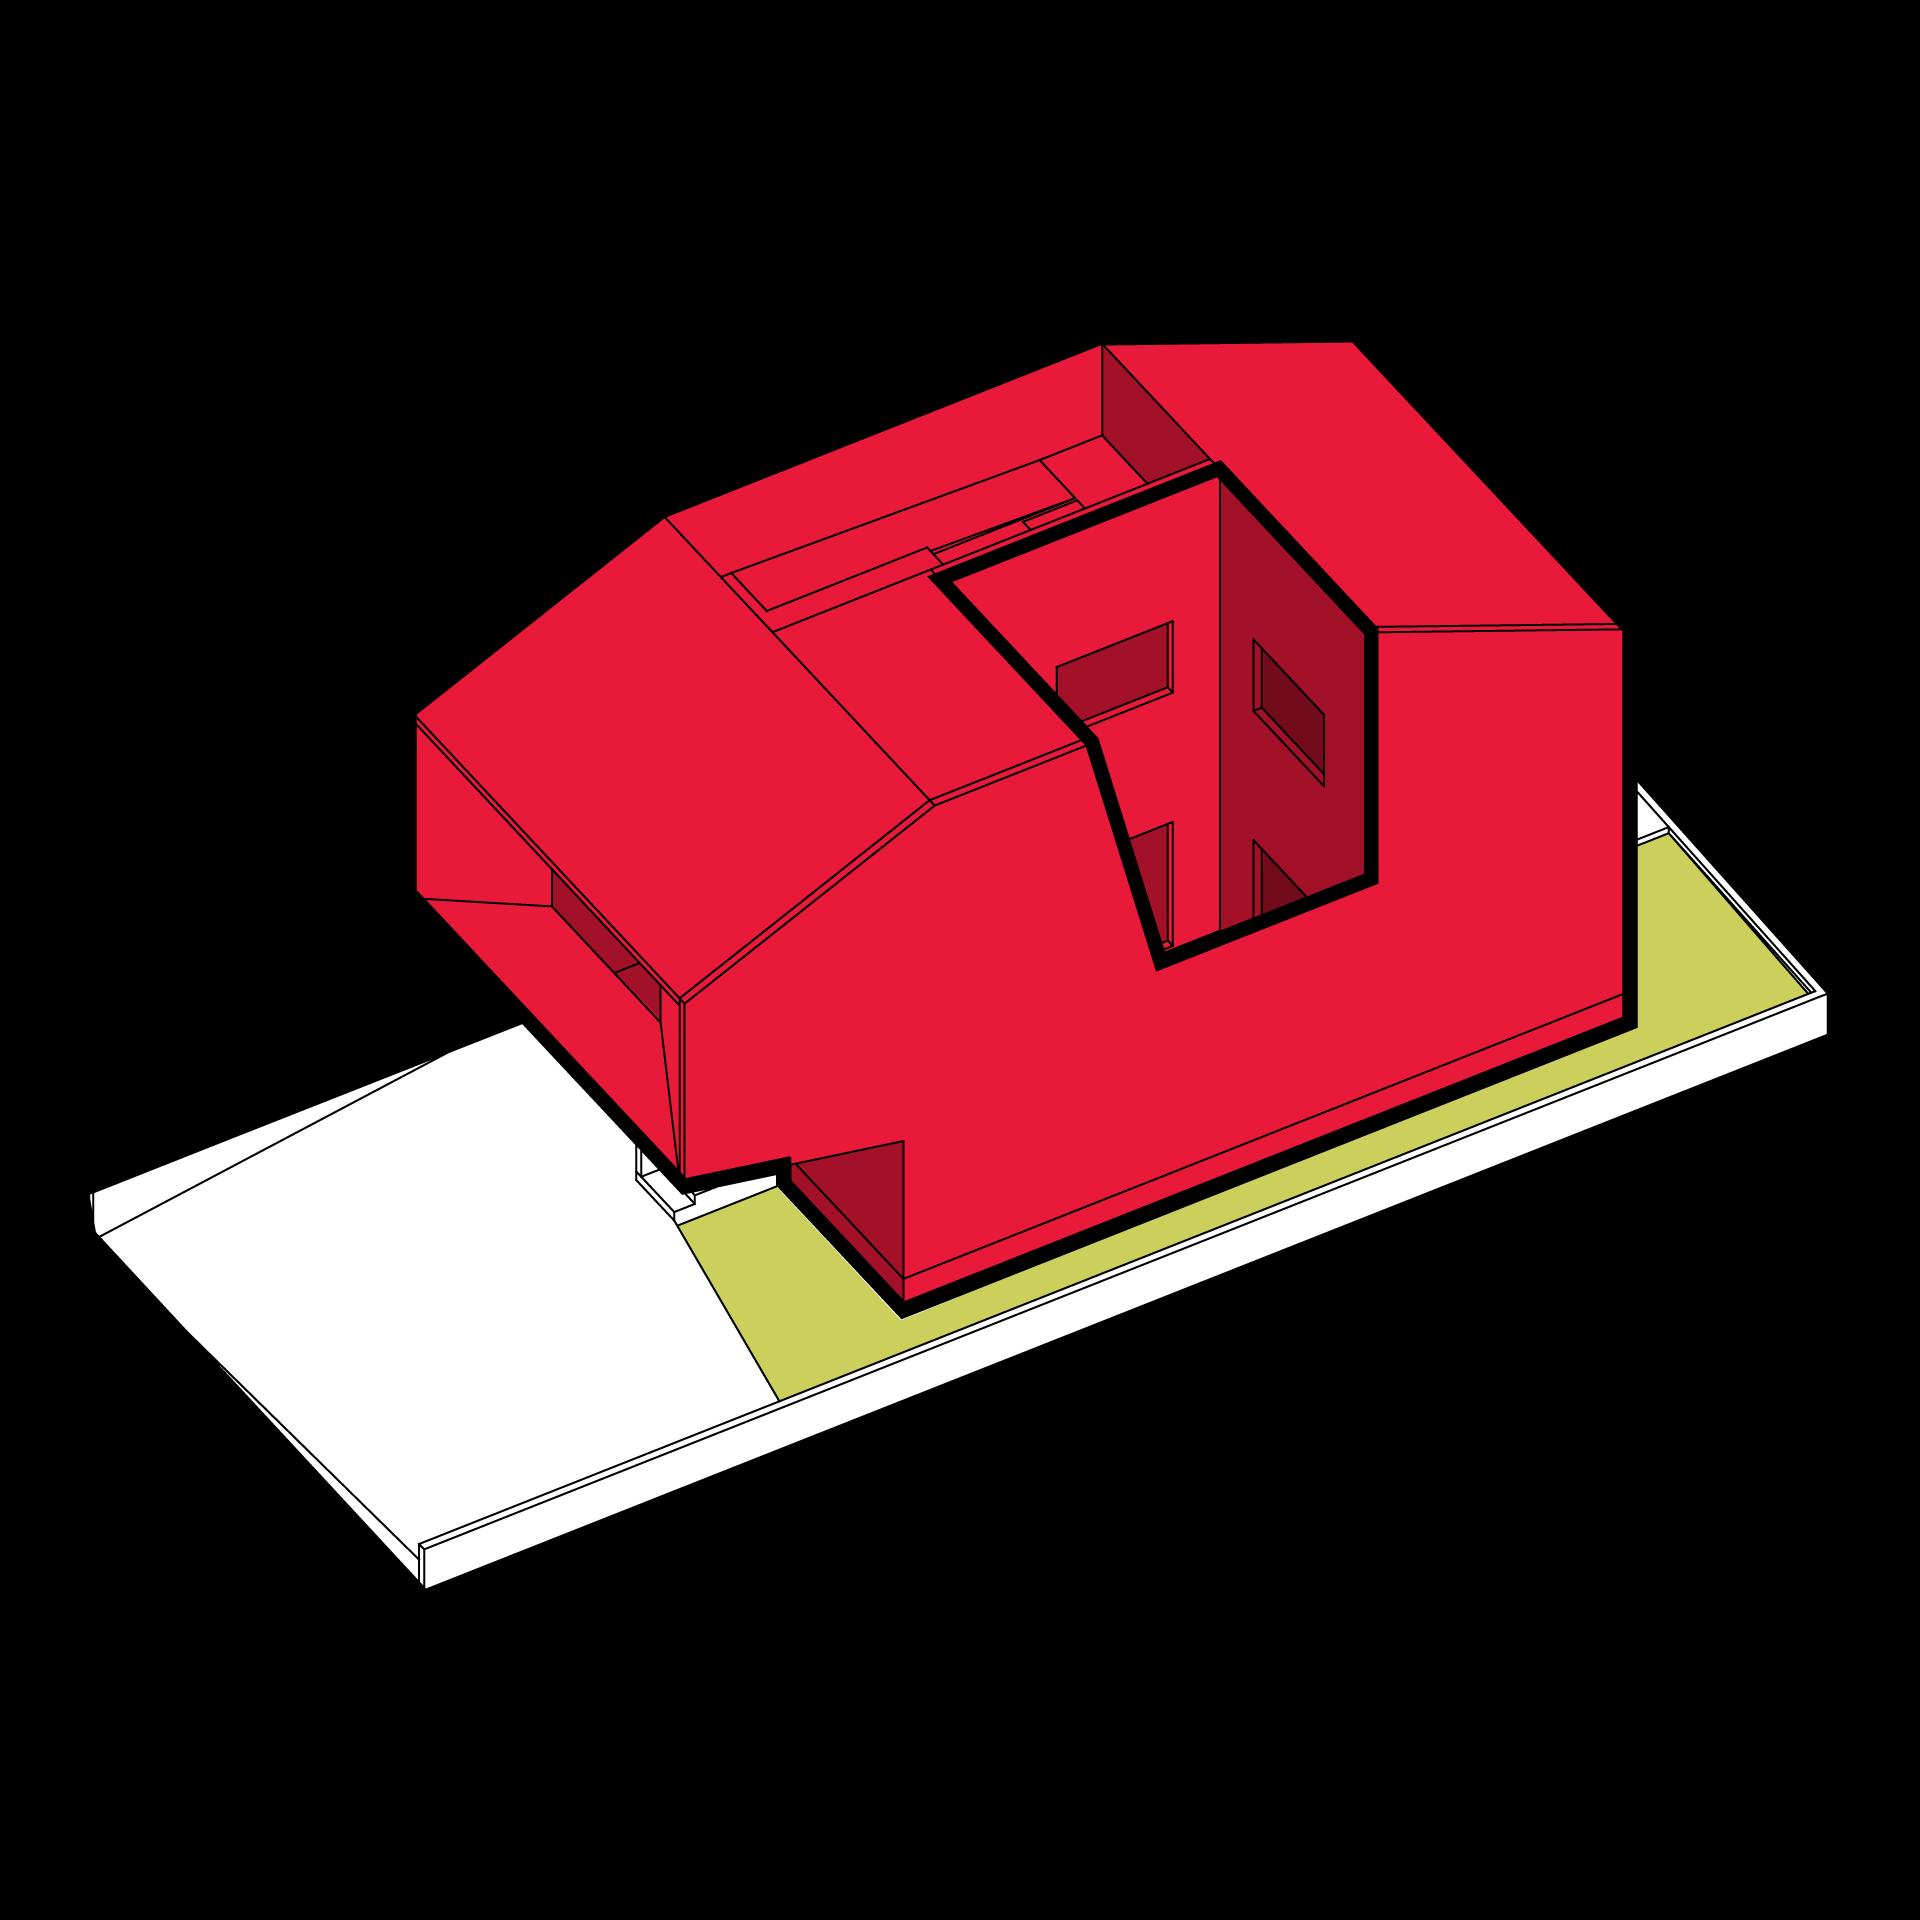 Hansha reflection house studio. Earthquake clipart building structure